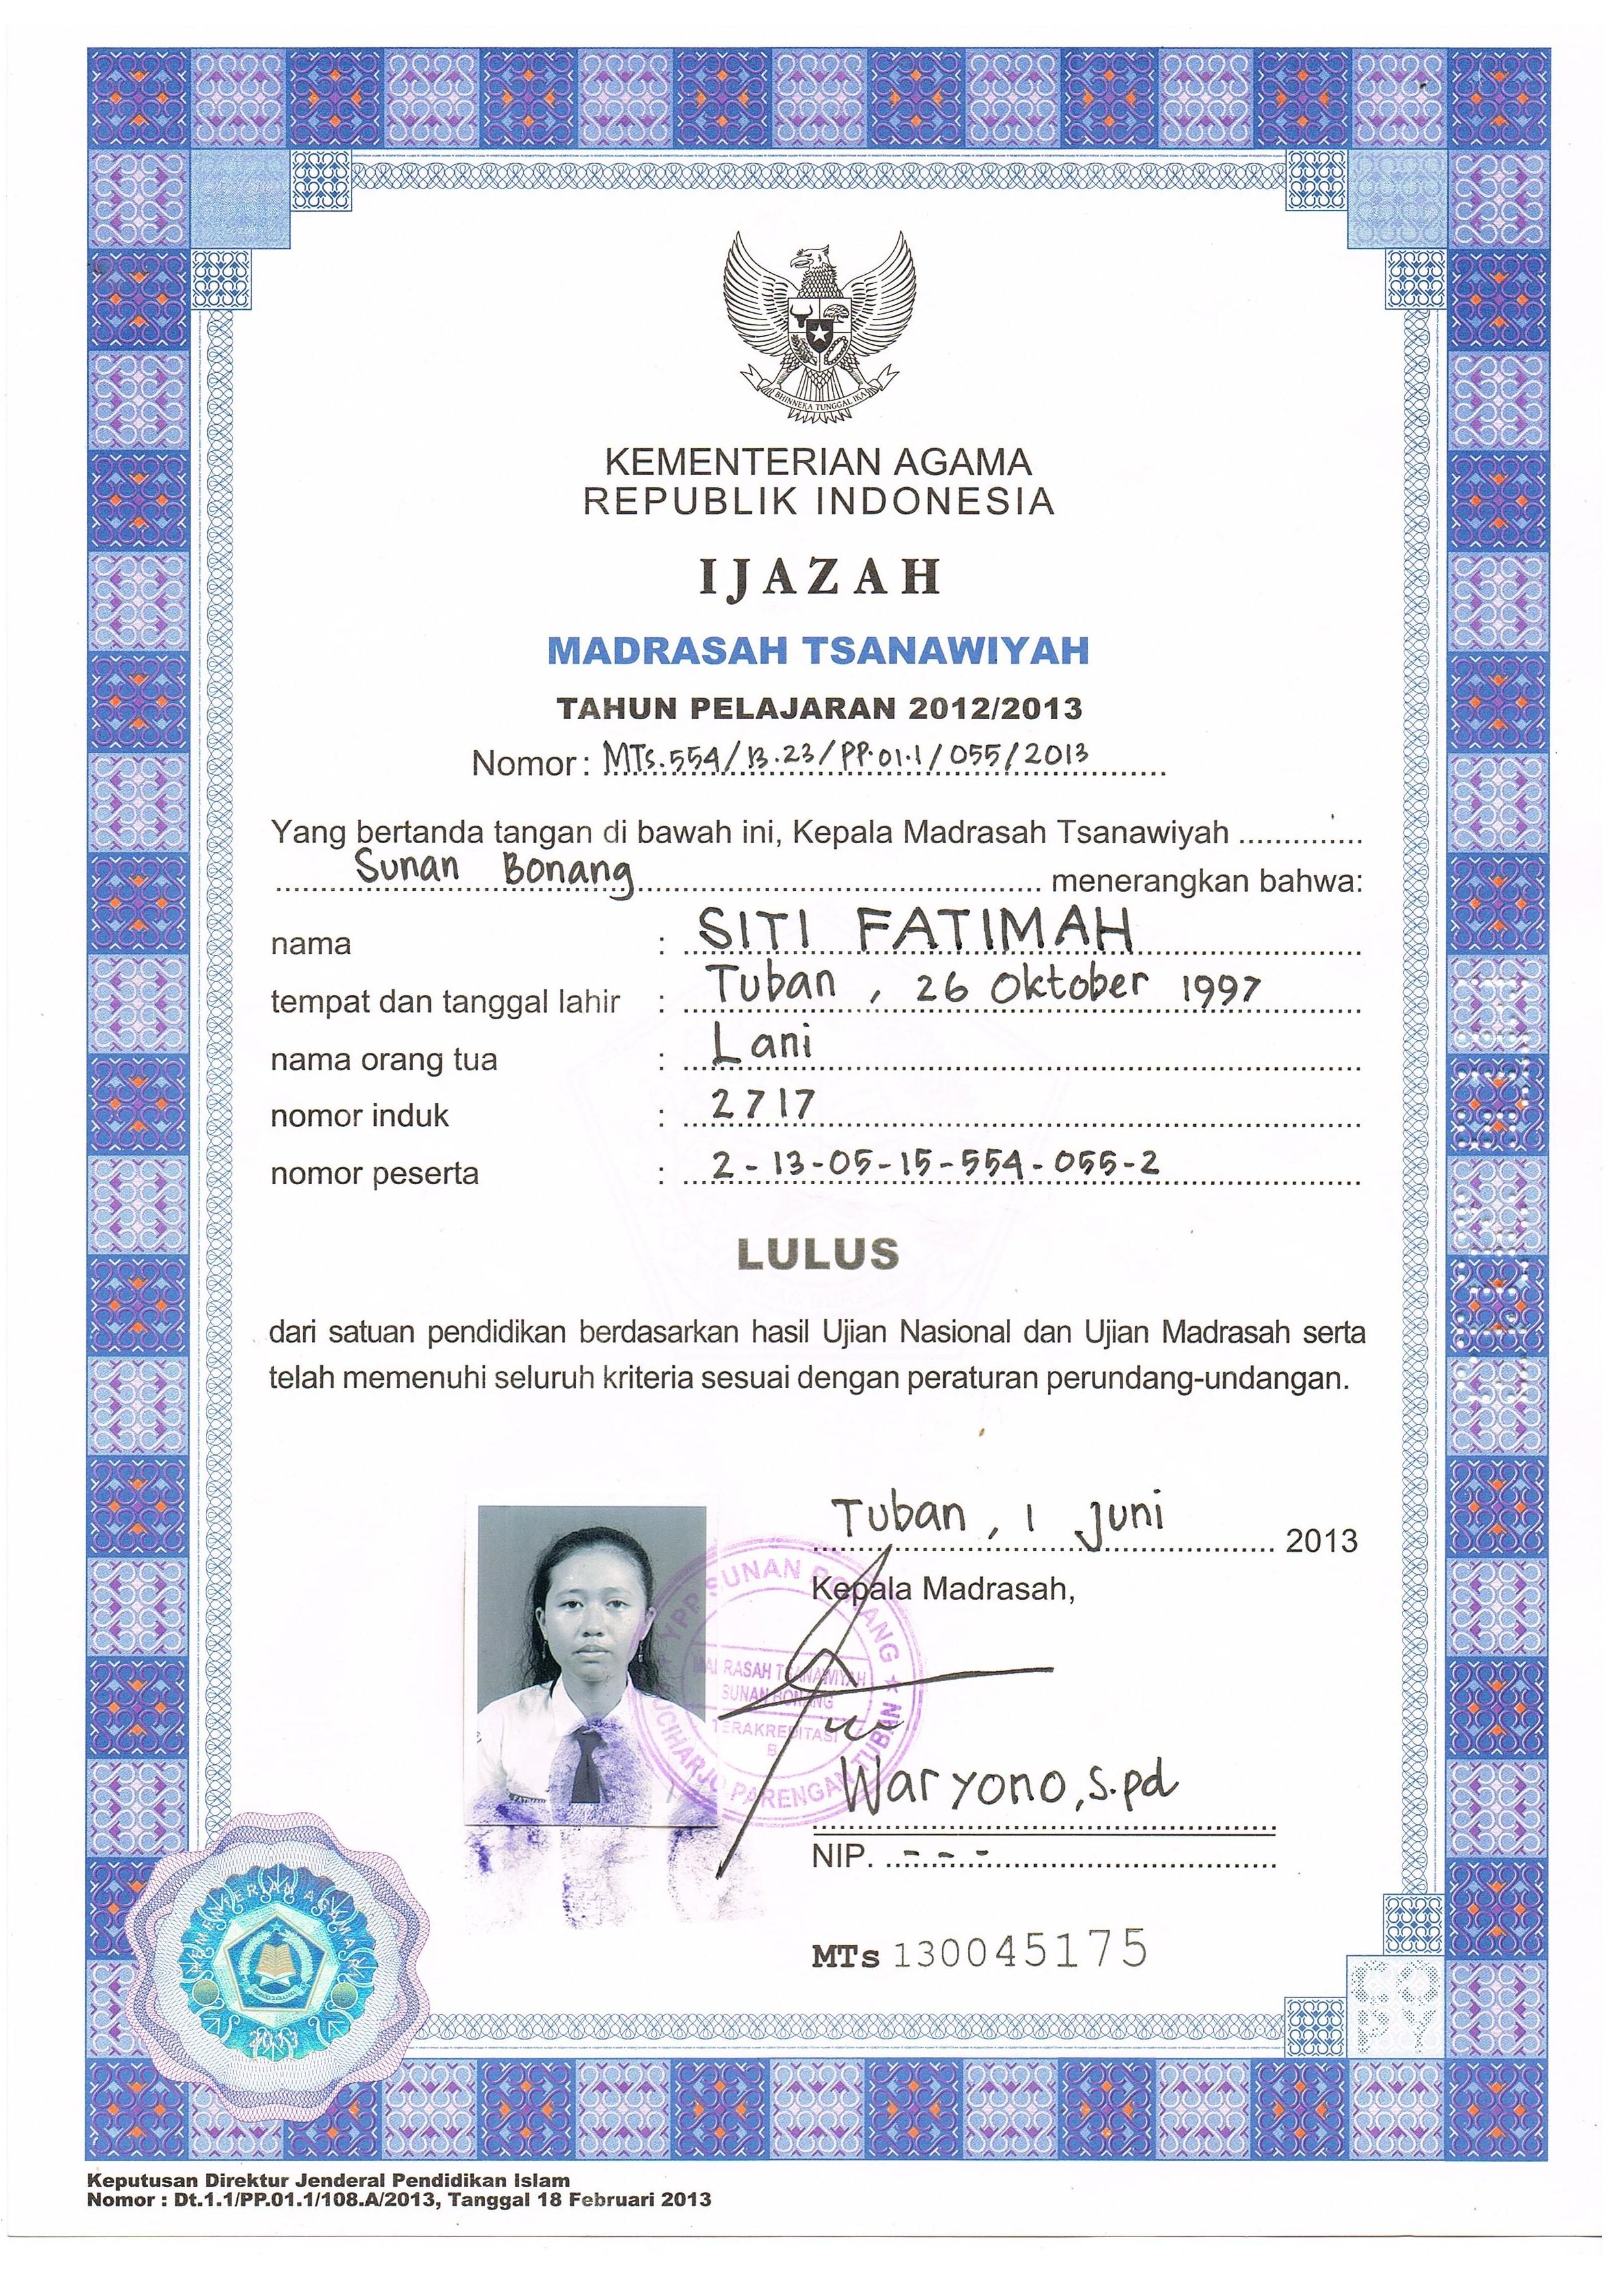 Contoh Profil Kinerja Guru Quality Audit Wikipedia The Free Encyclopedia Mts Sunan Bonang Parengan Pobox 15 Suciharjo – Parengan – Tuban